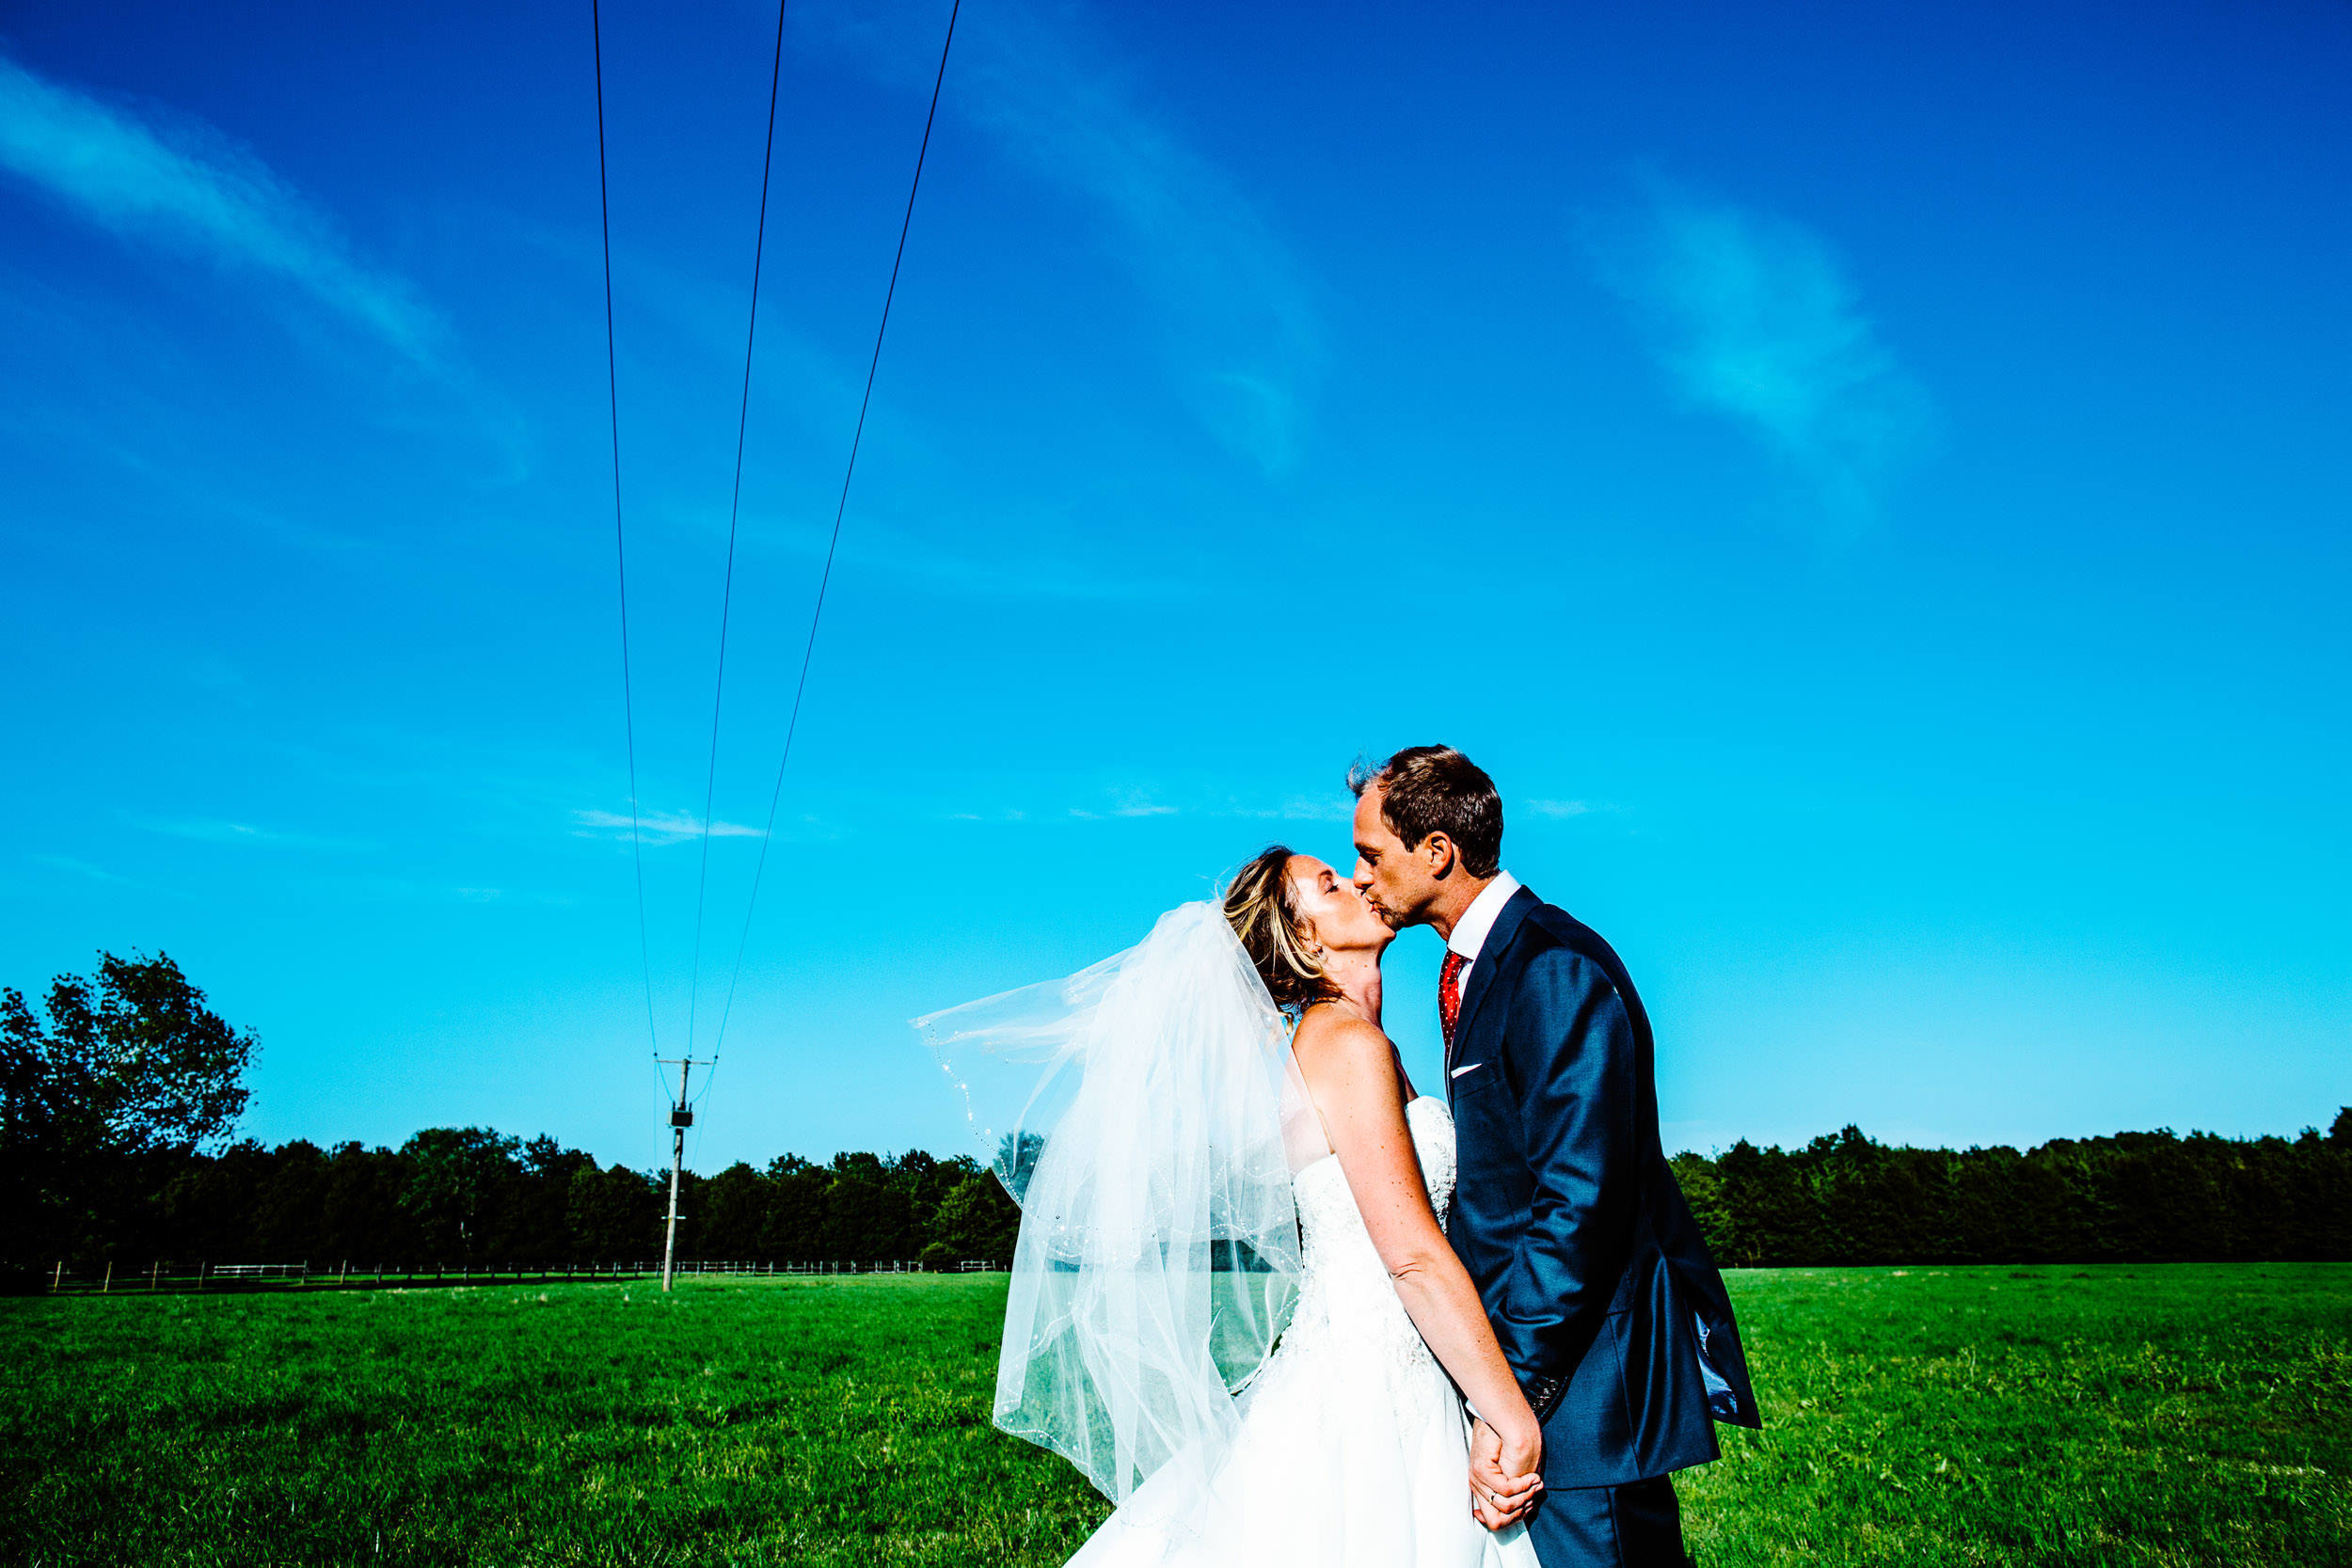 Rectory Farm Wedding - Cambridge - K+W